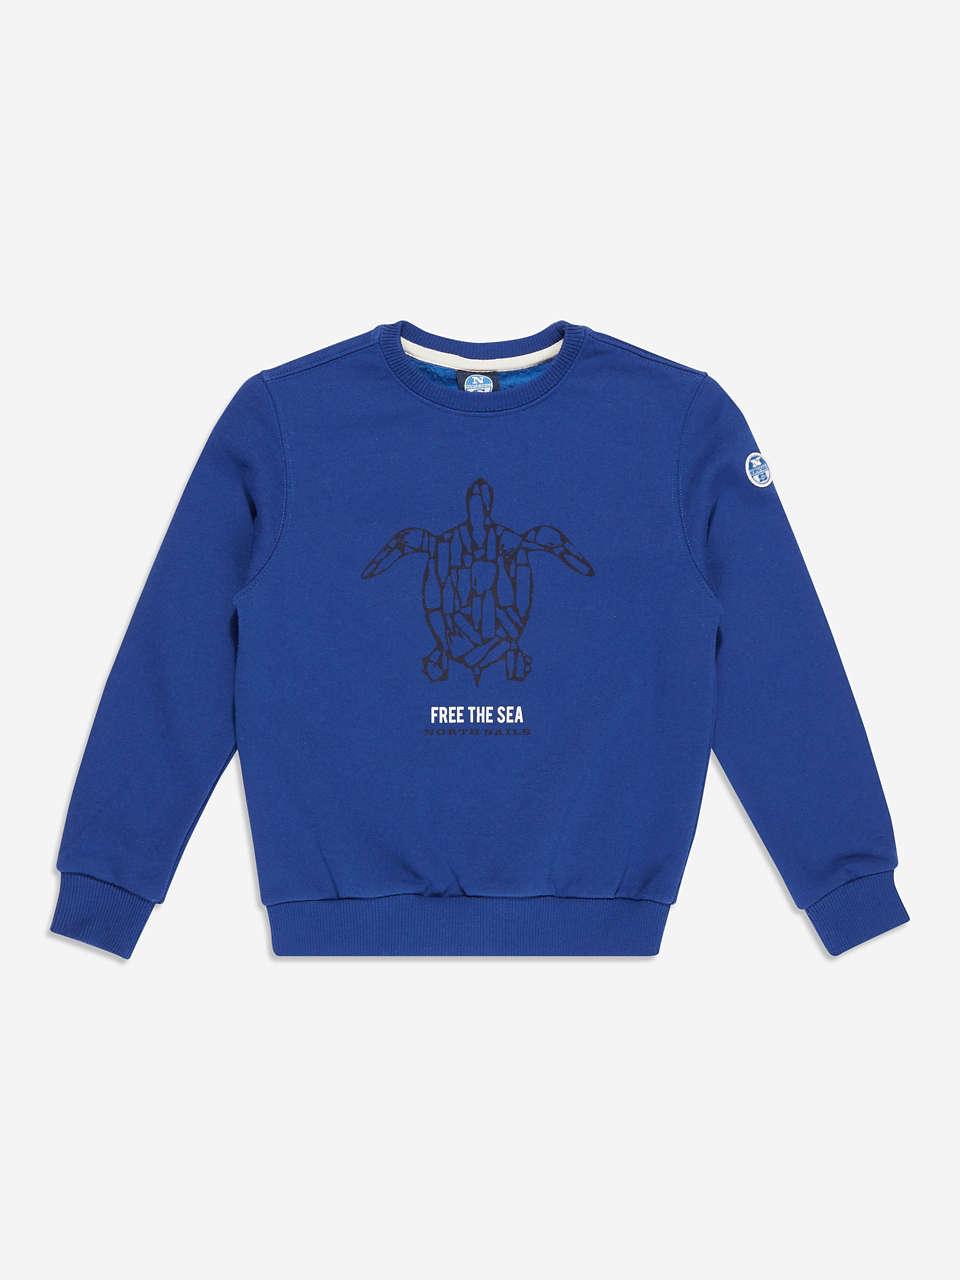 Round Neck Longsleeve  Sweater